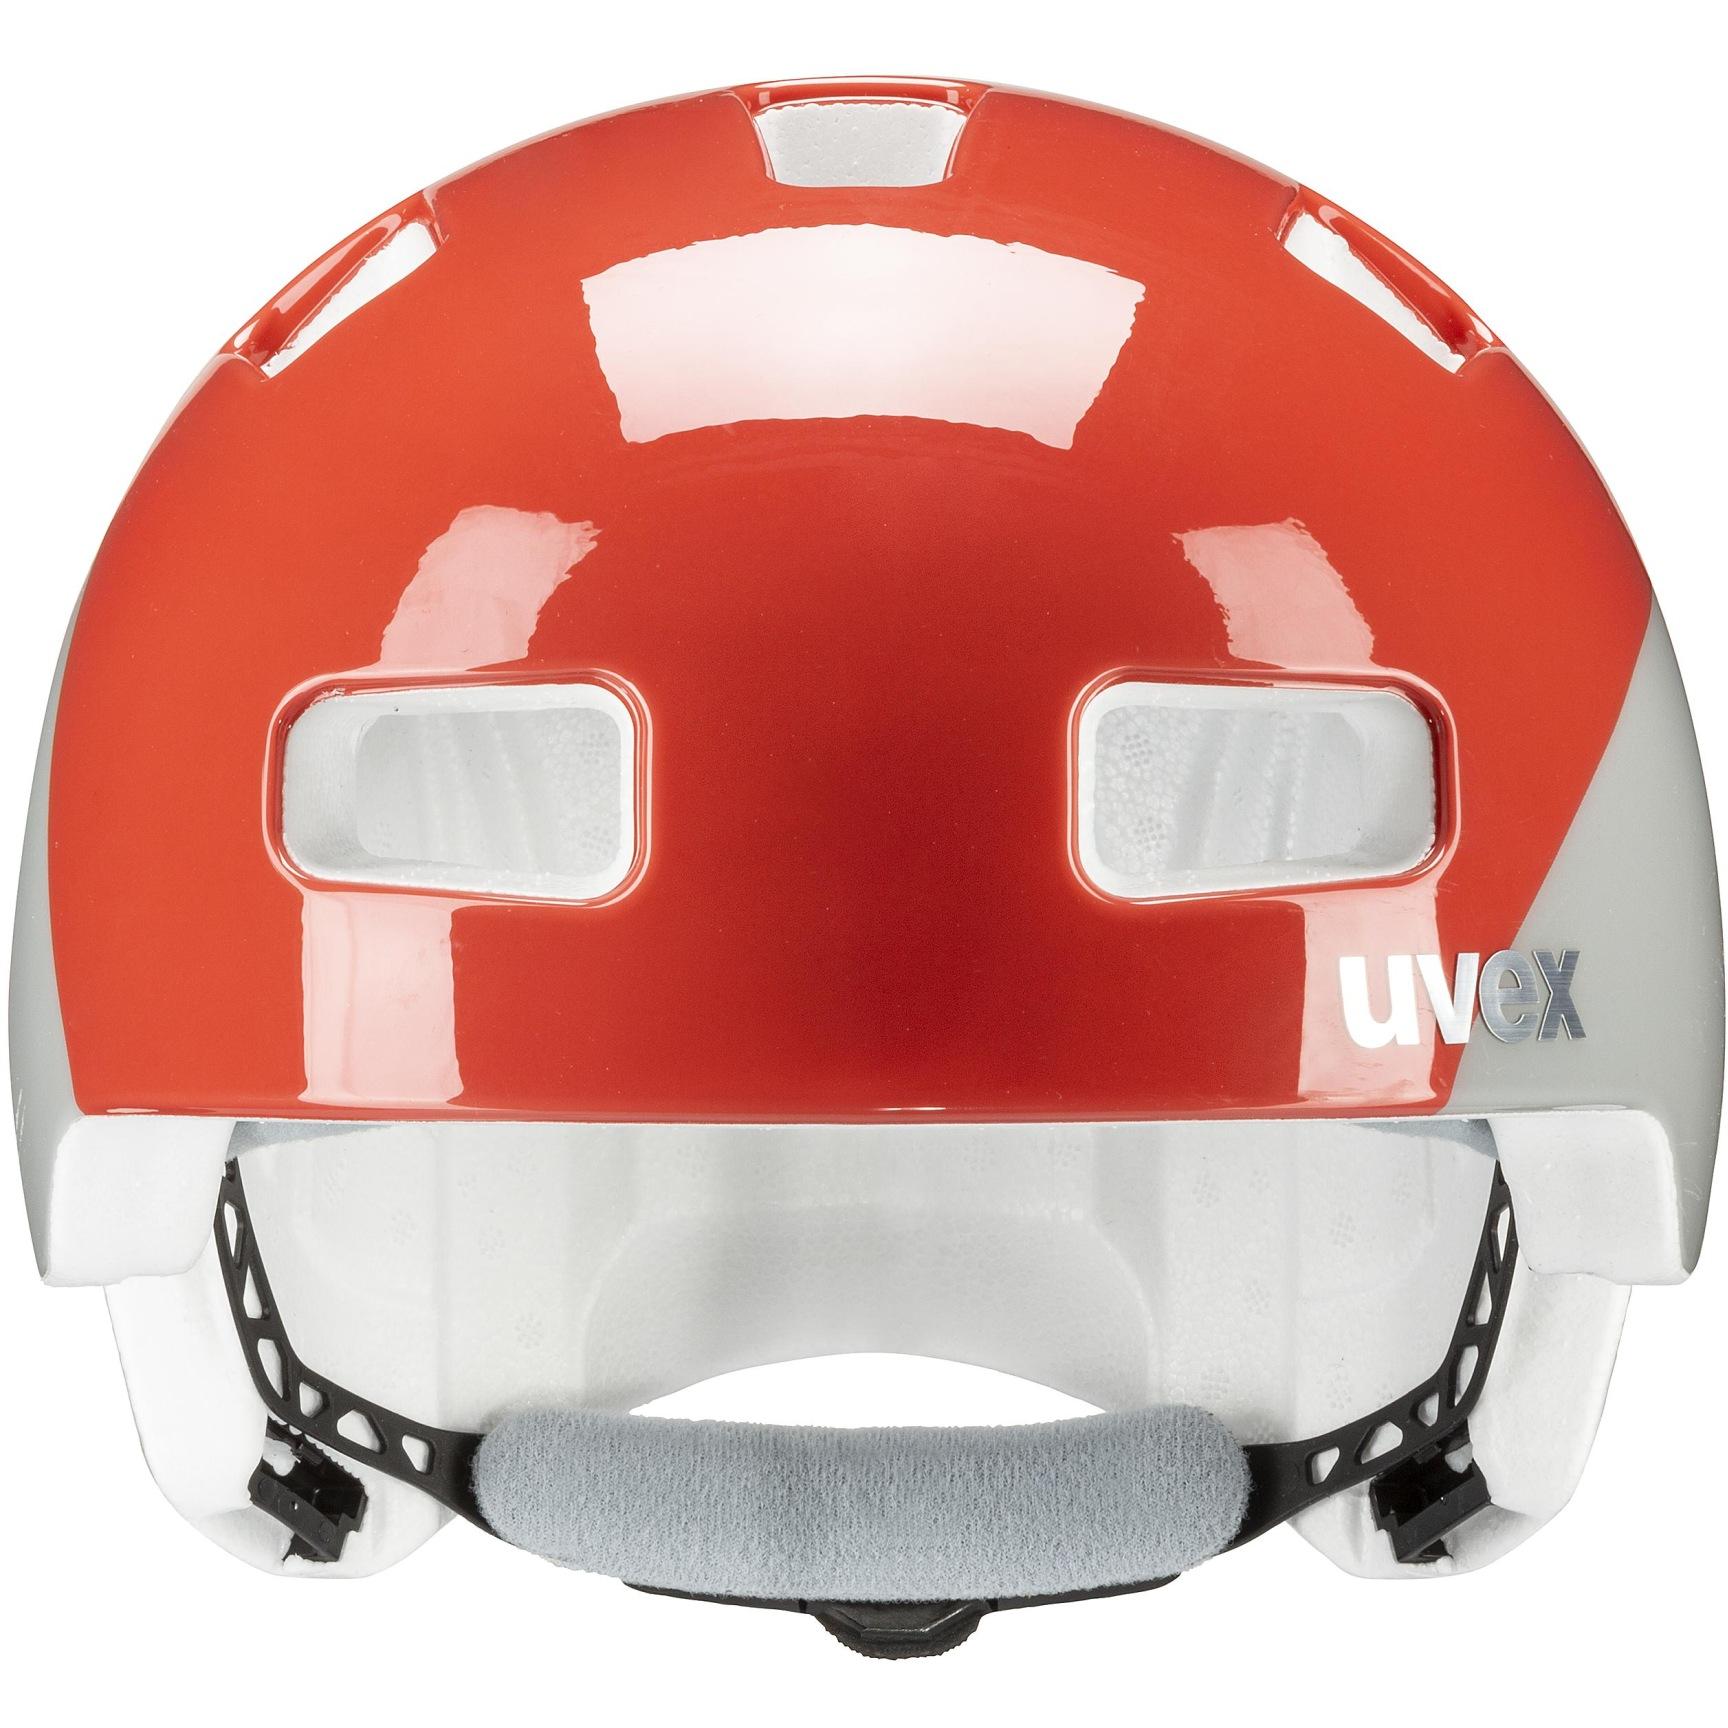 Image of Uvex hlmt 4 Kids Helmet - grapefruit-grey wave